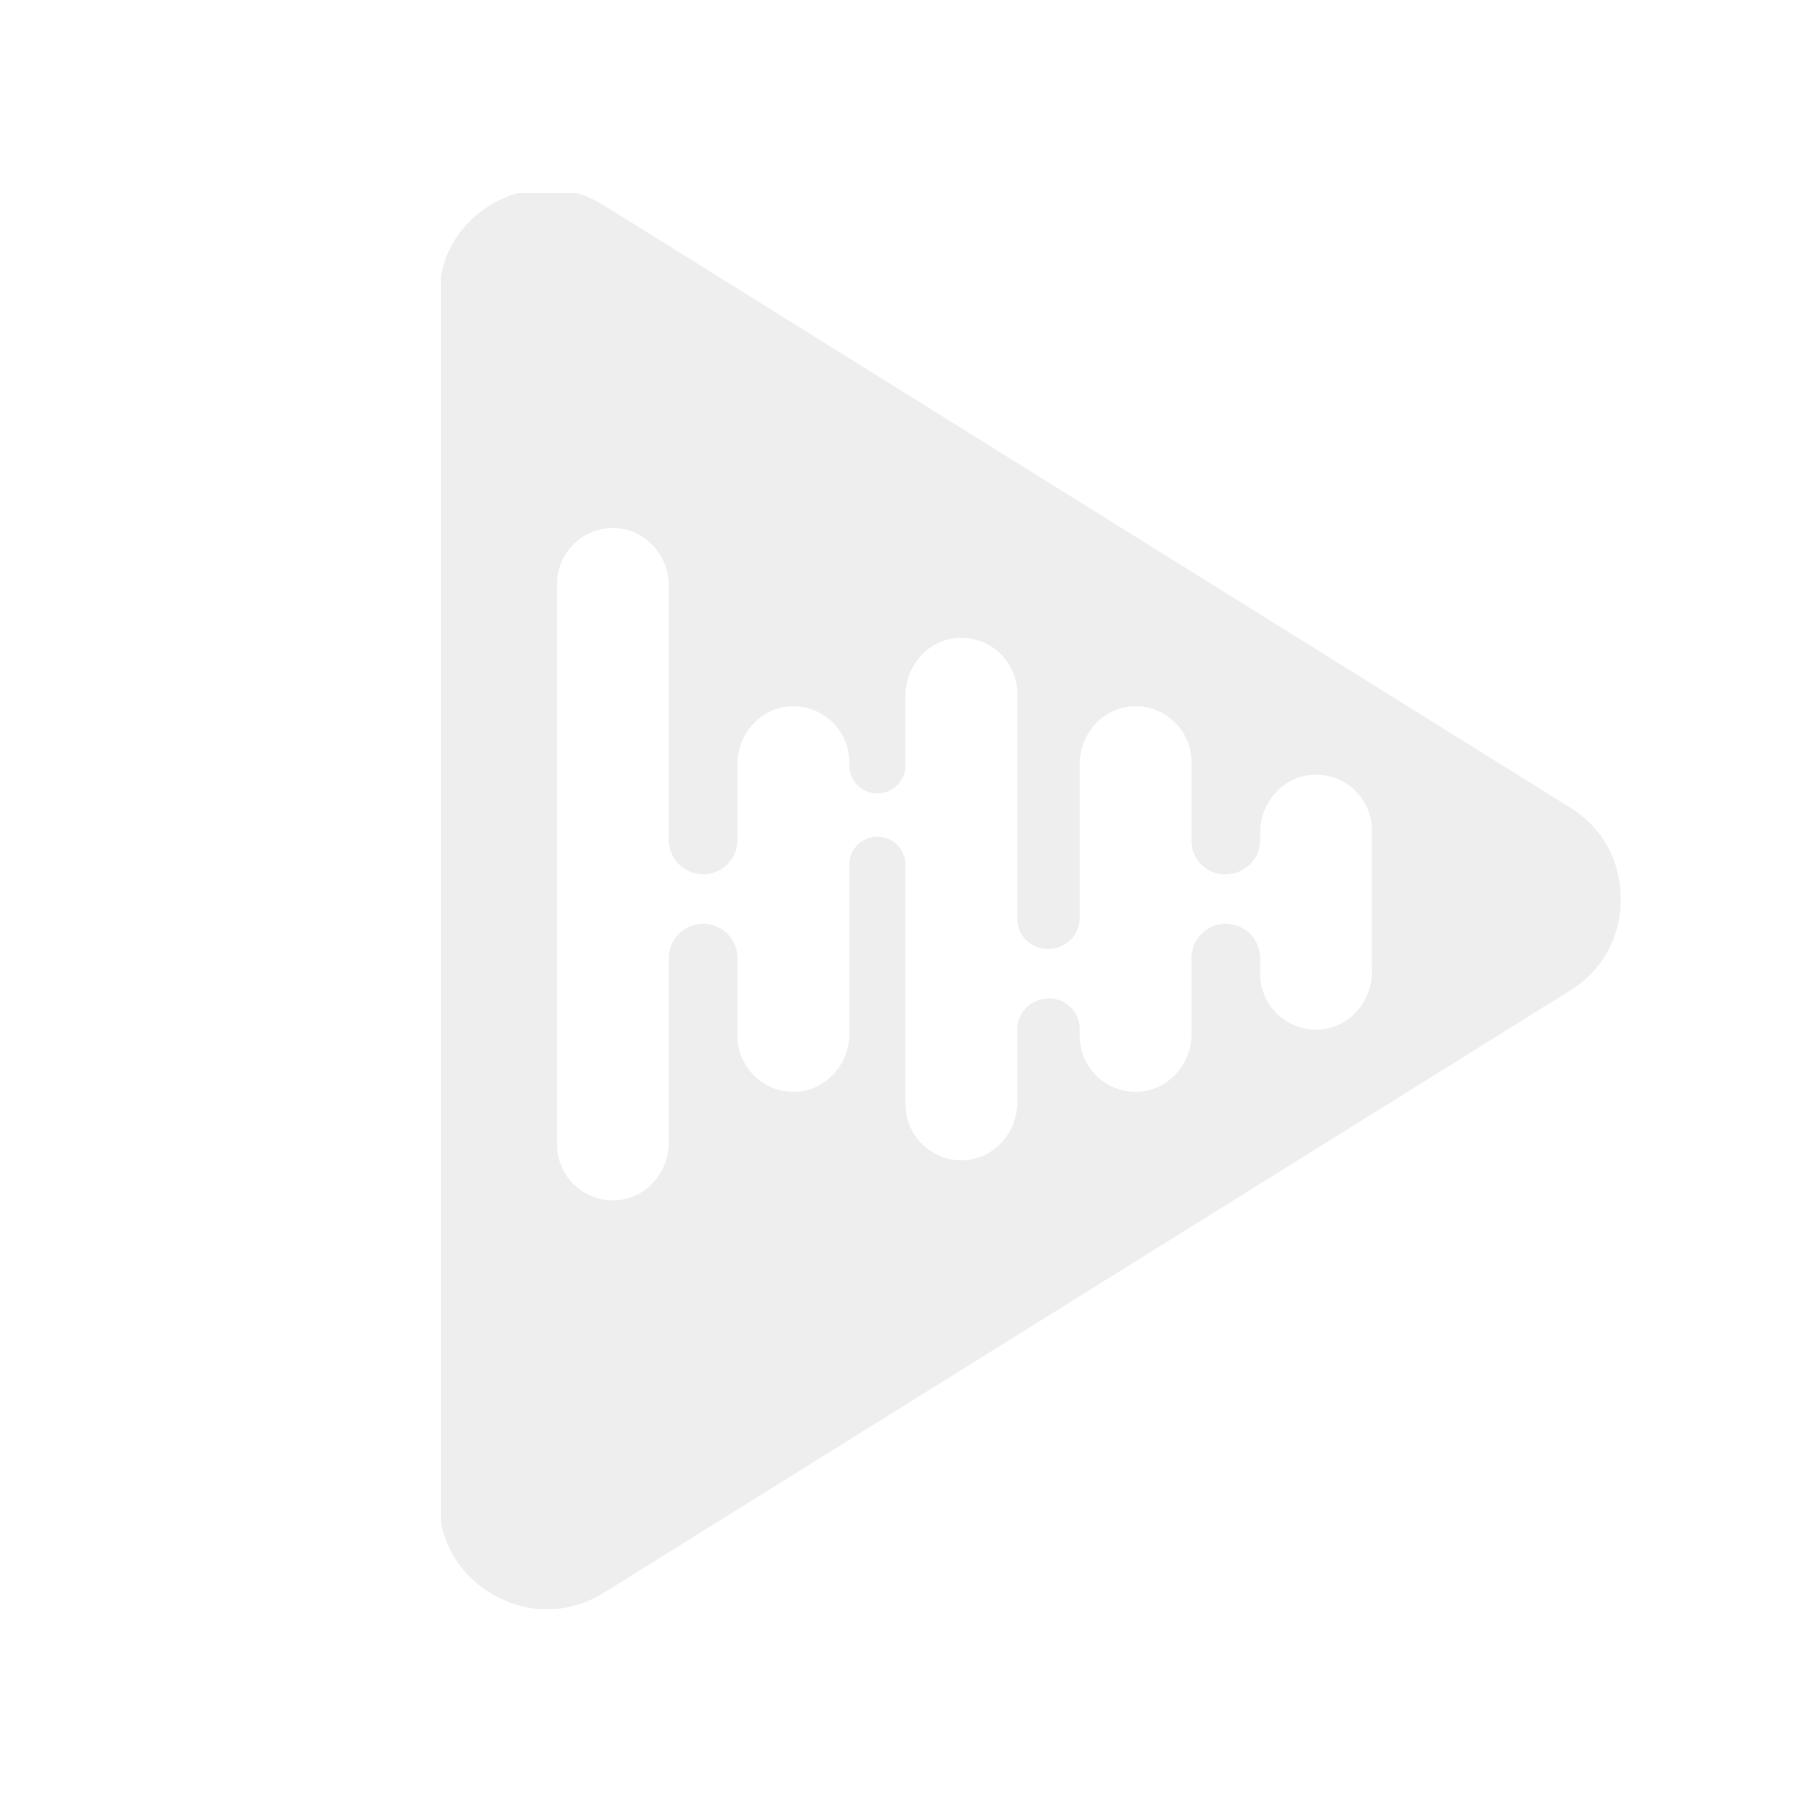 Klipsch 1011765